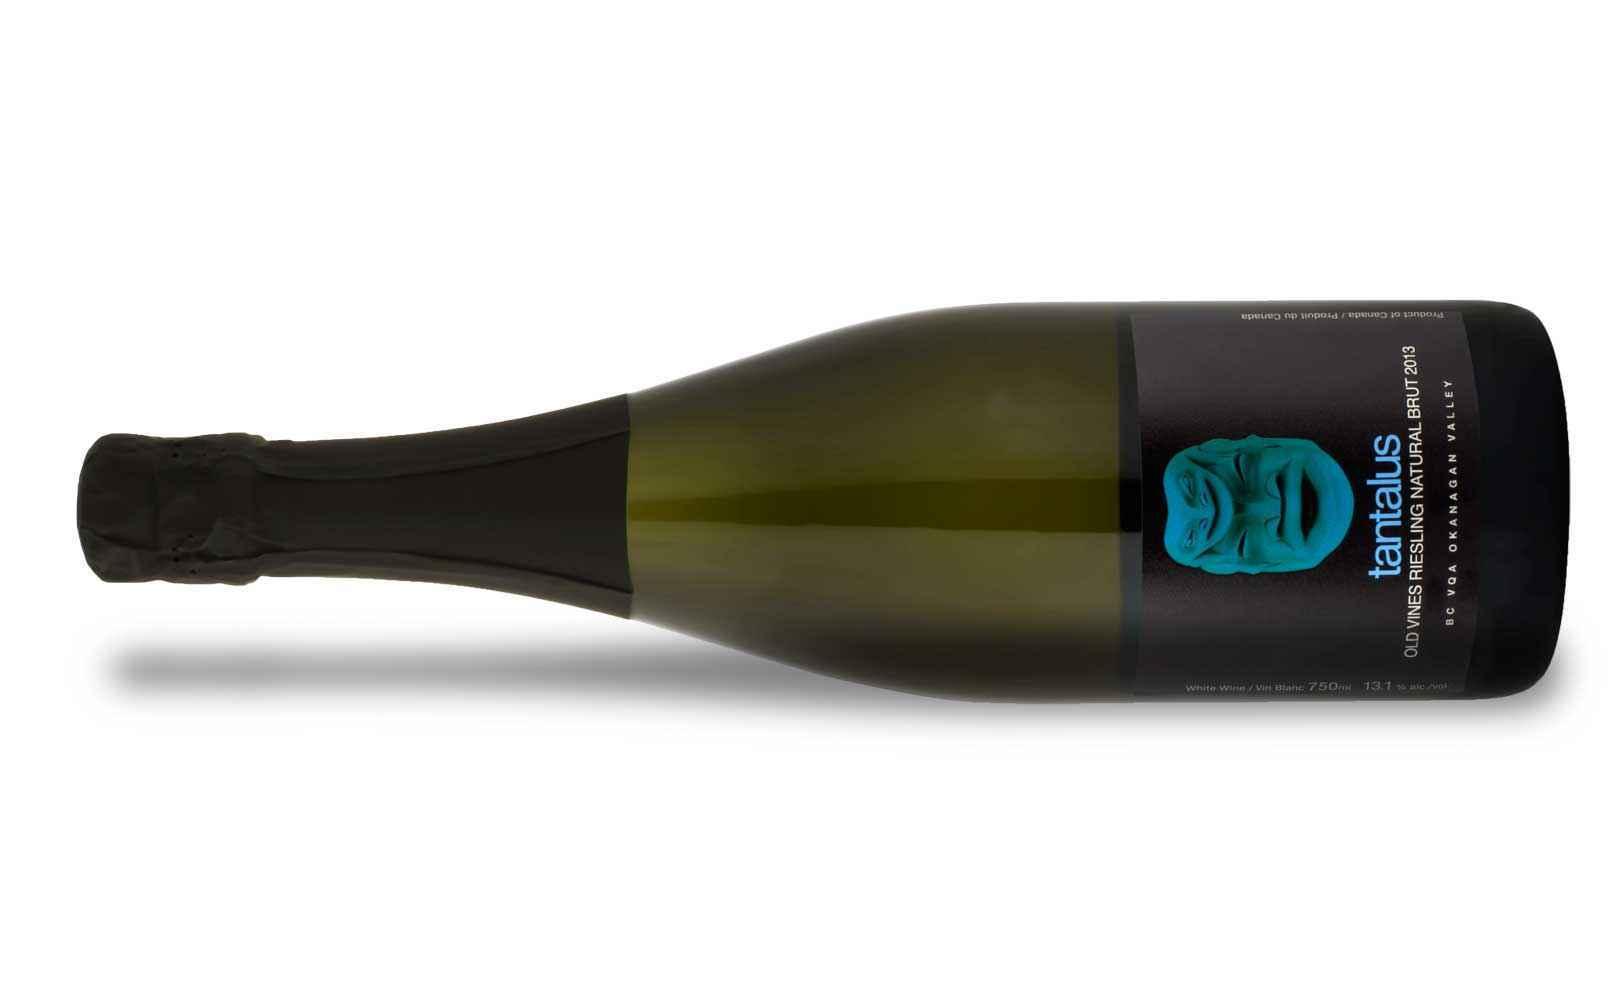 Go to 2013 Tantalus Riesling Old Vines Natural Brut von Tantalus Vineyards aus Okanagan Valley/BC, Kanada